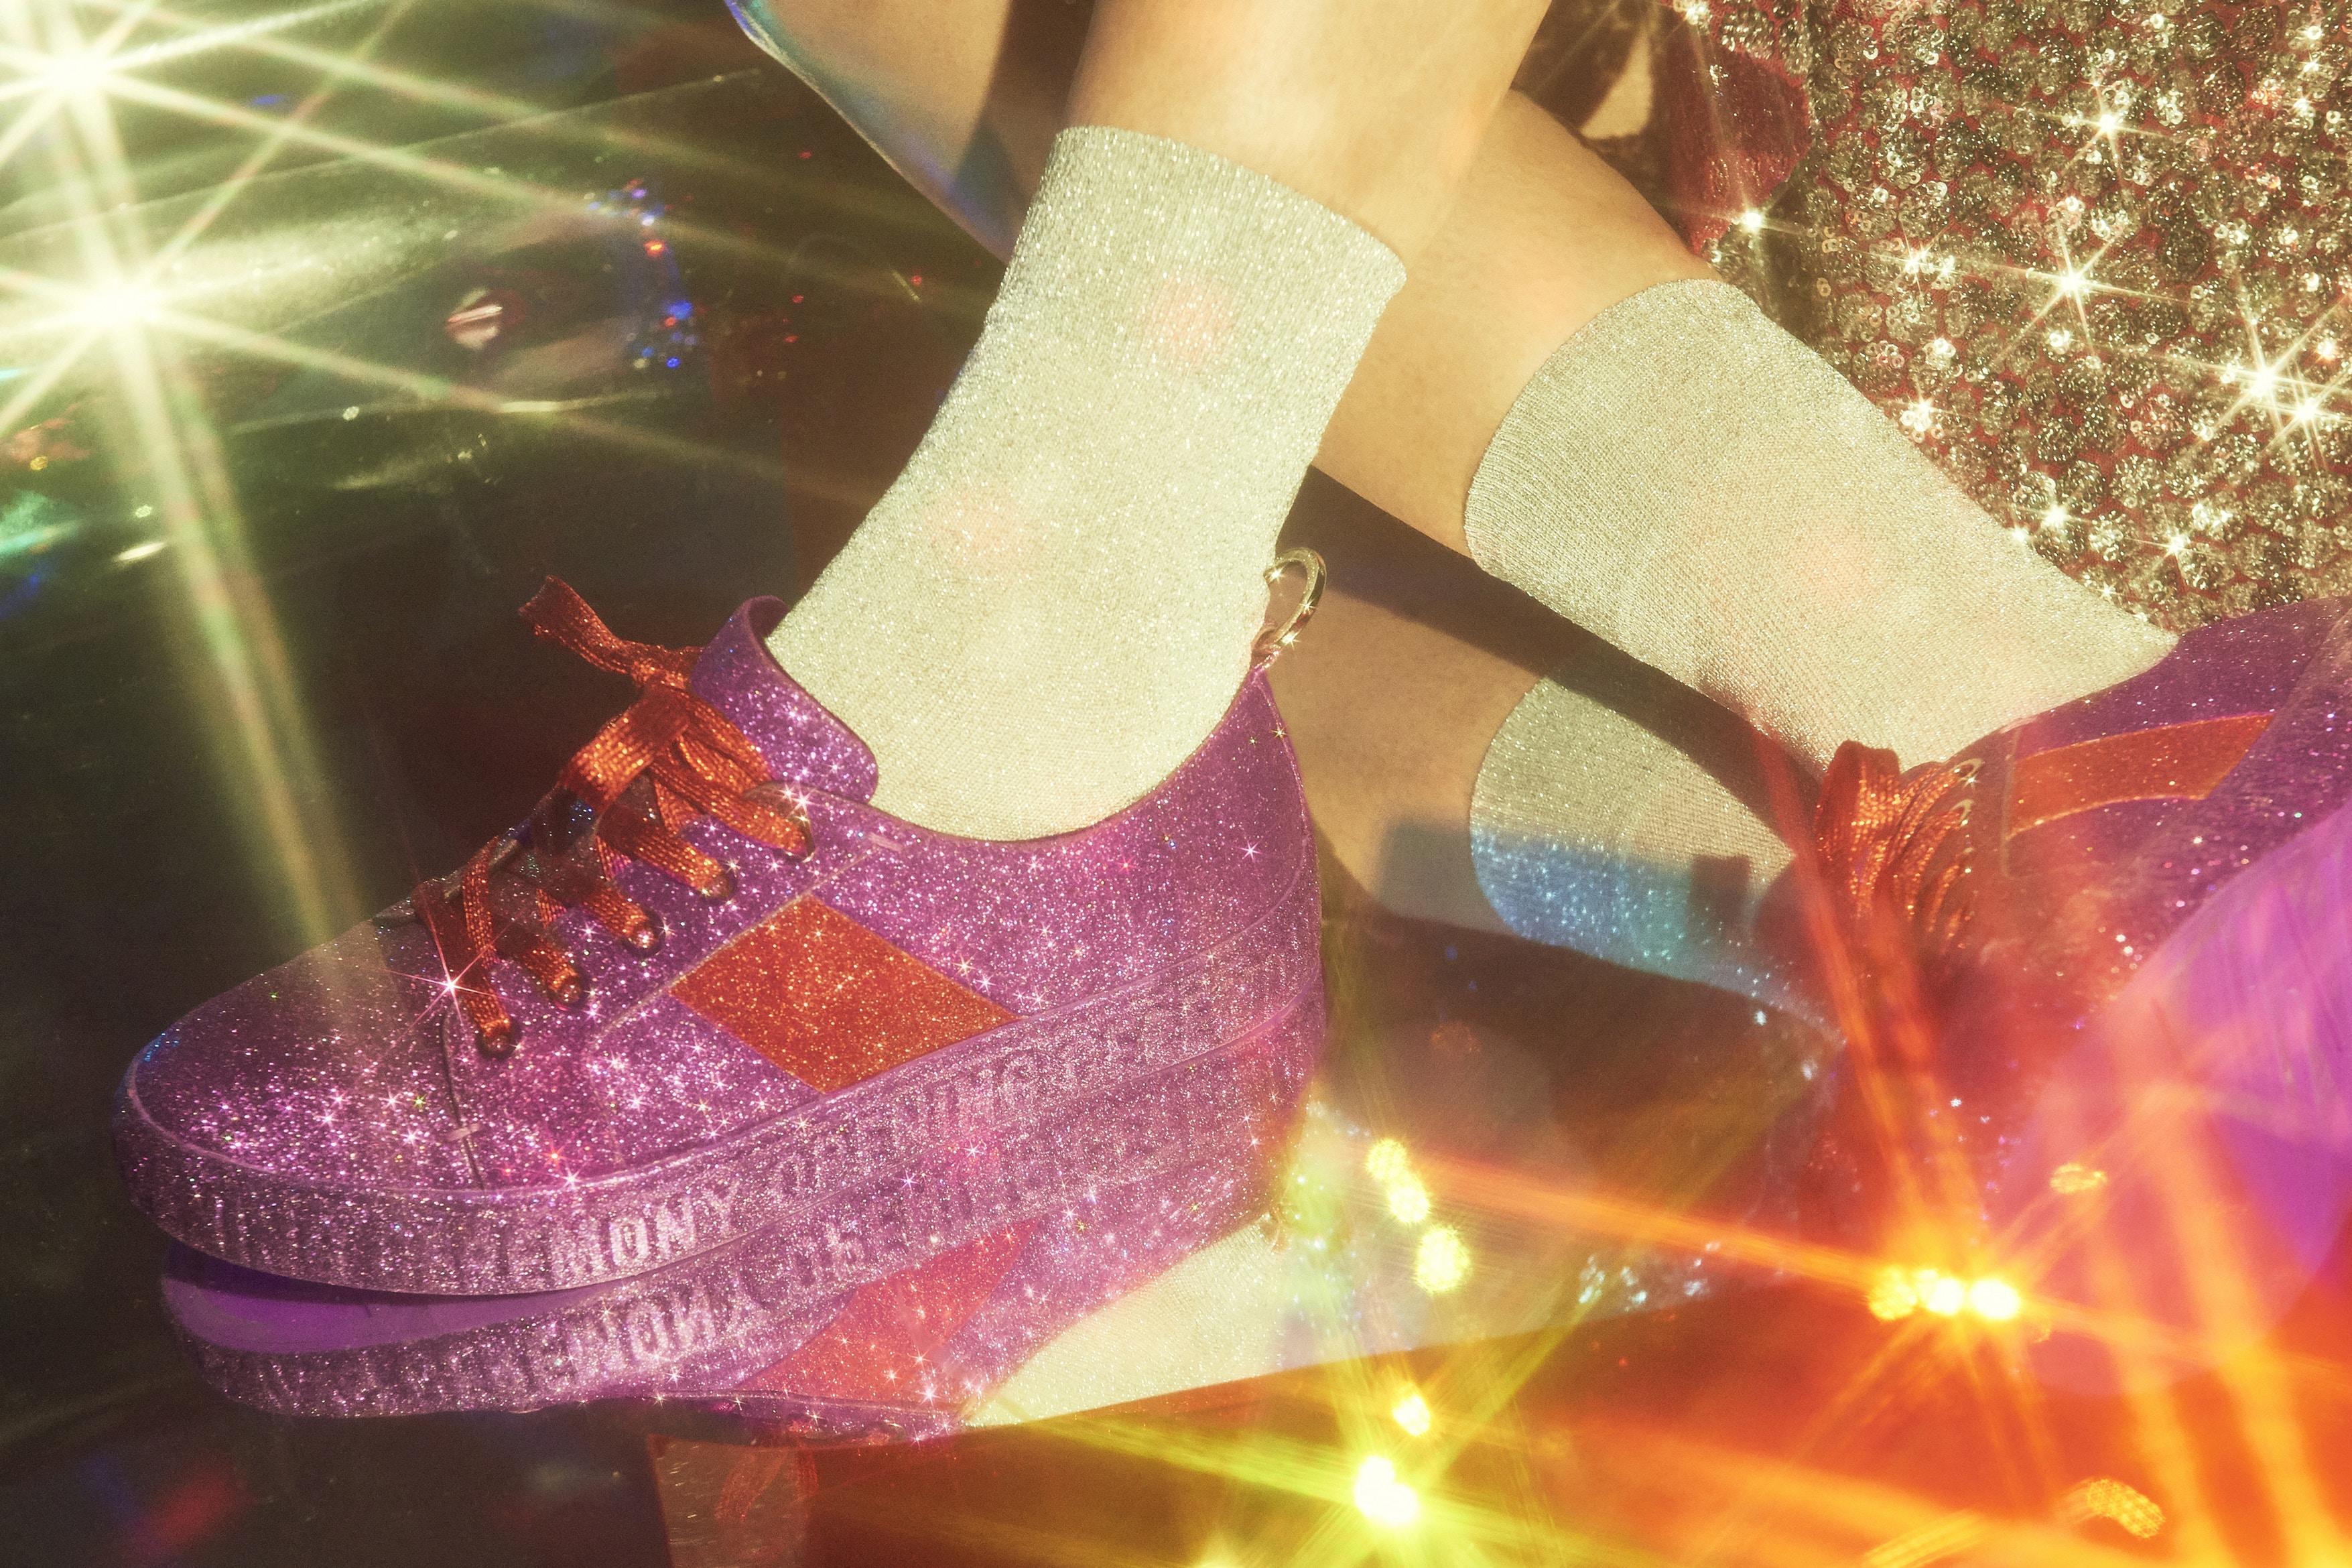 opening-ceremony-glitter-la-cinega-sneakers-6